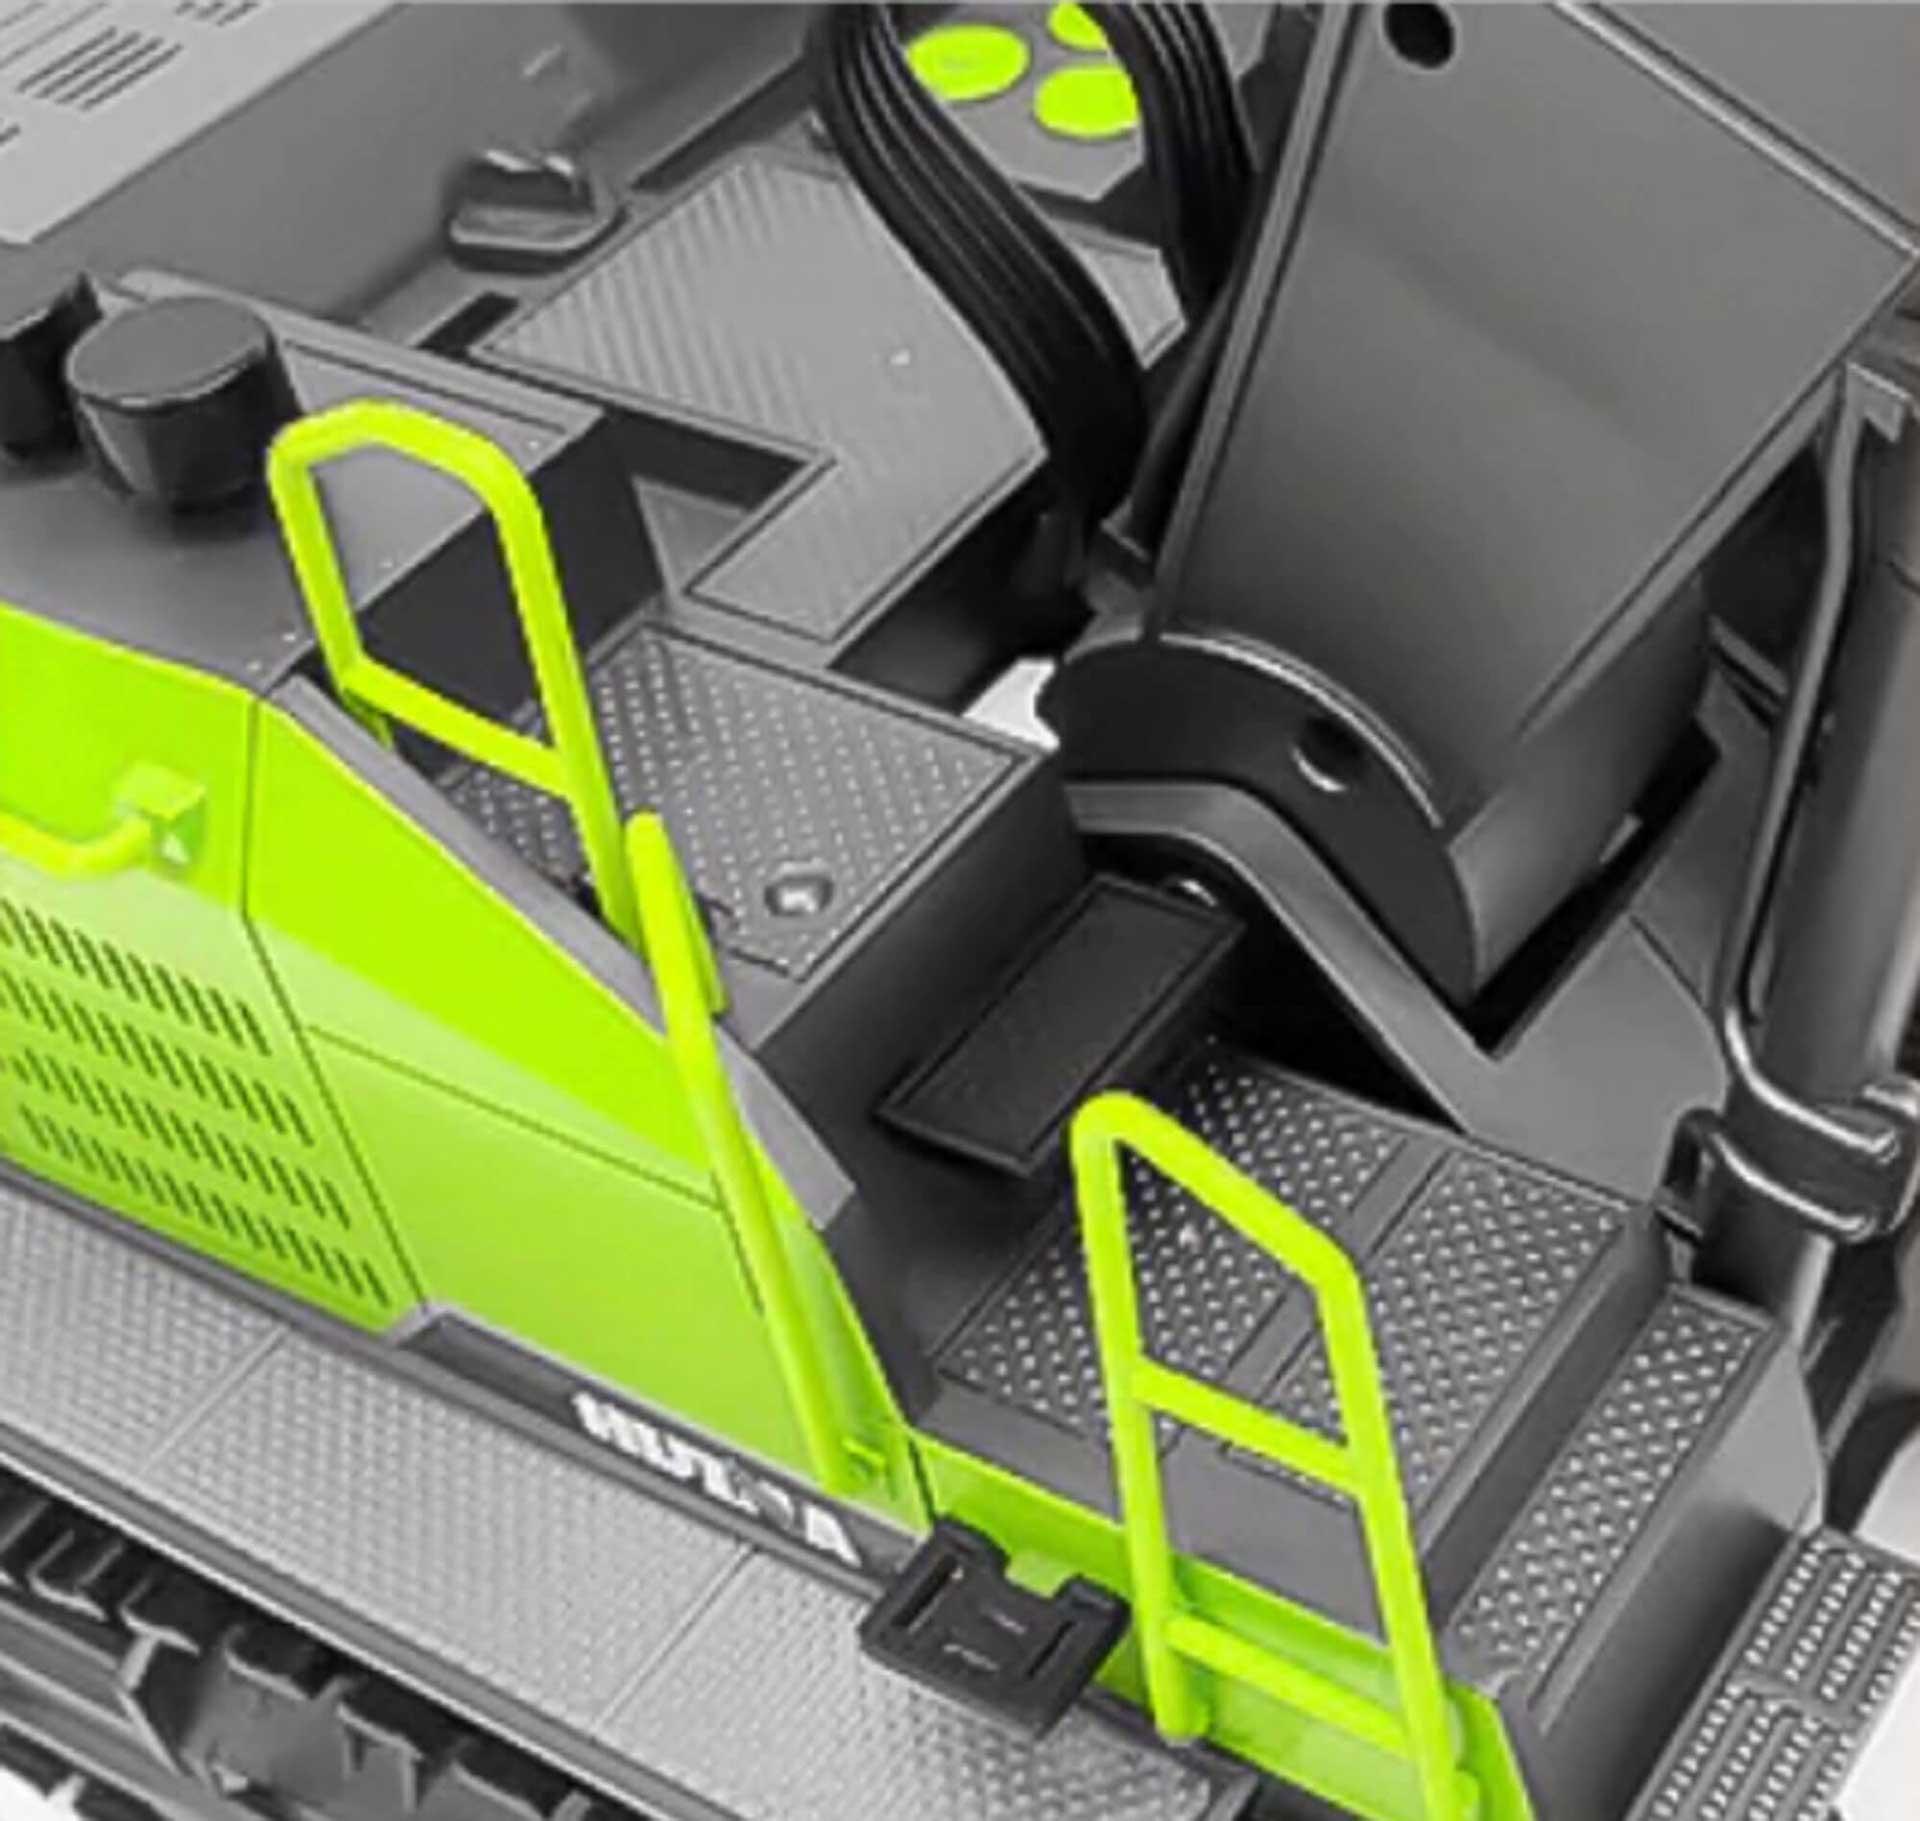 FM-ELECTRICS Kettenbagger 1:14 Grün mit hochwertiger Technik RTR